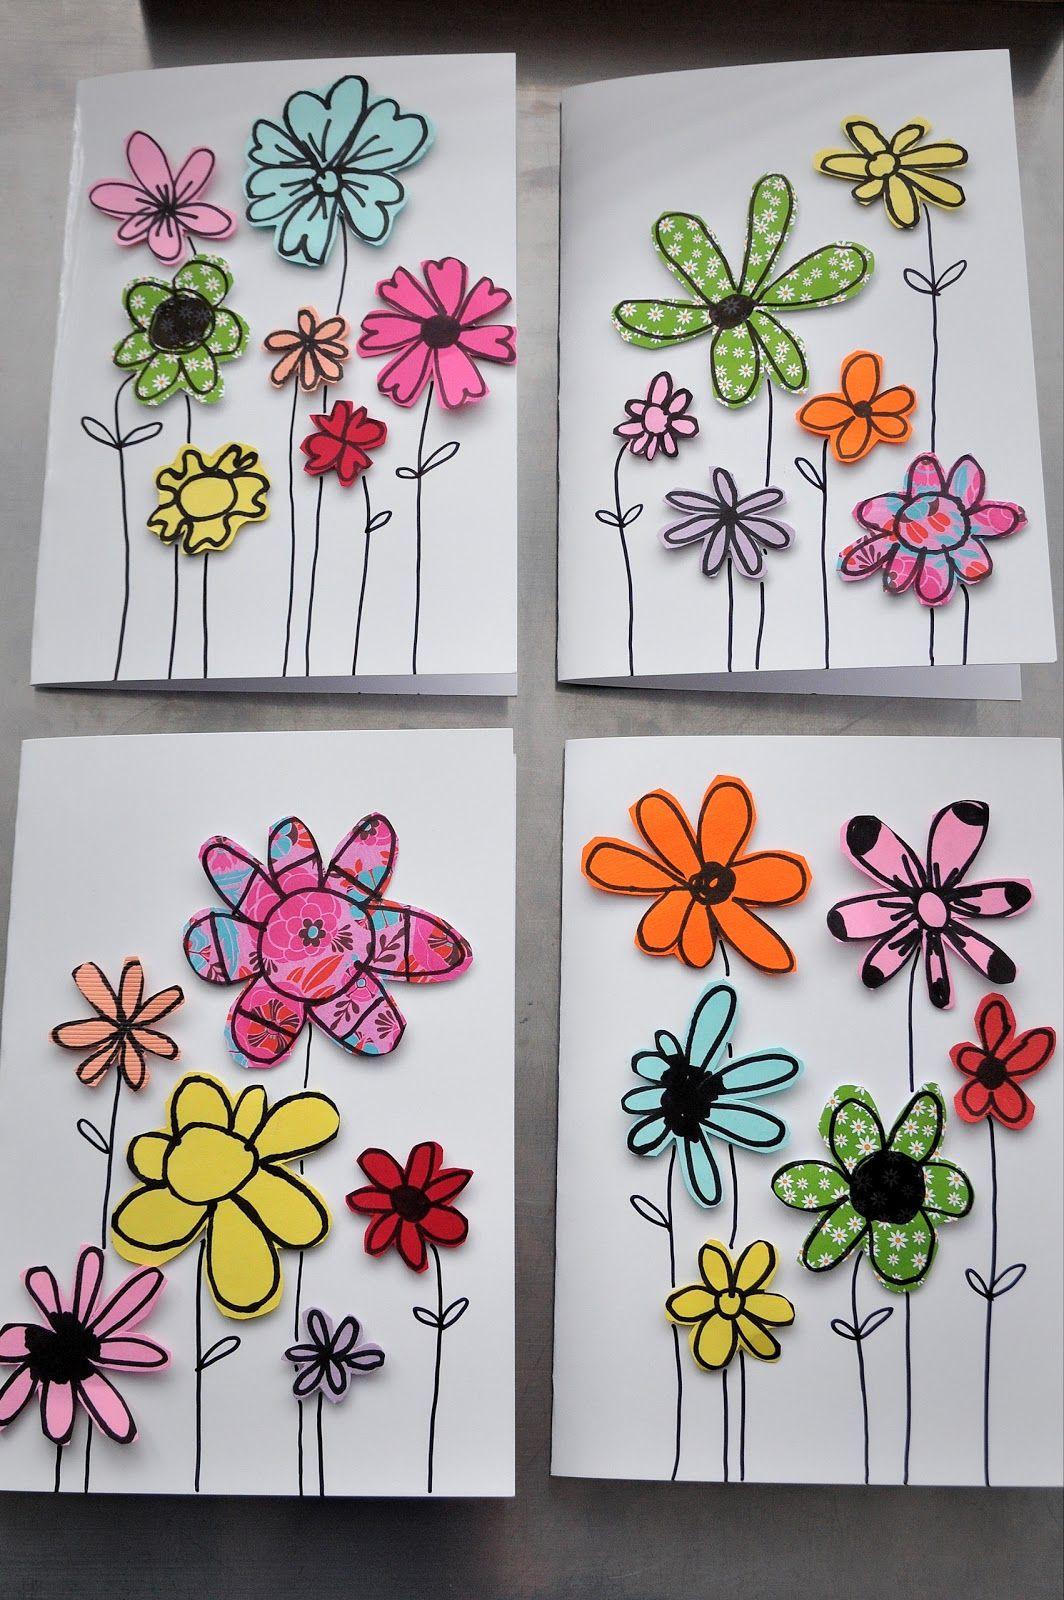 Diy paper scraps greeting cards crafts pinterest paper scraps